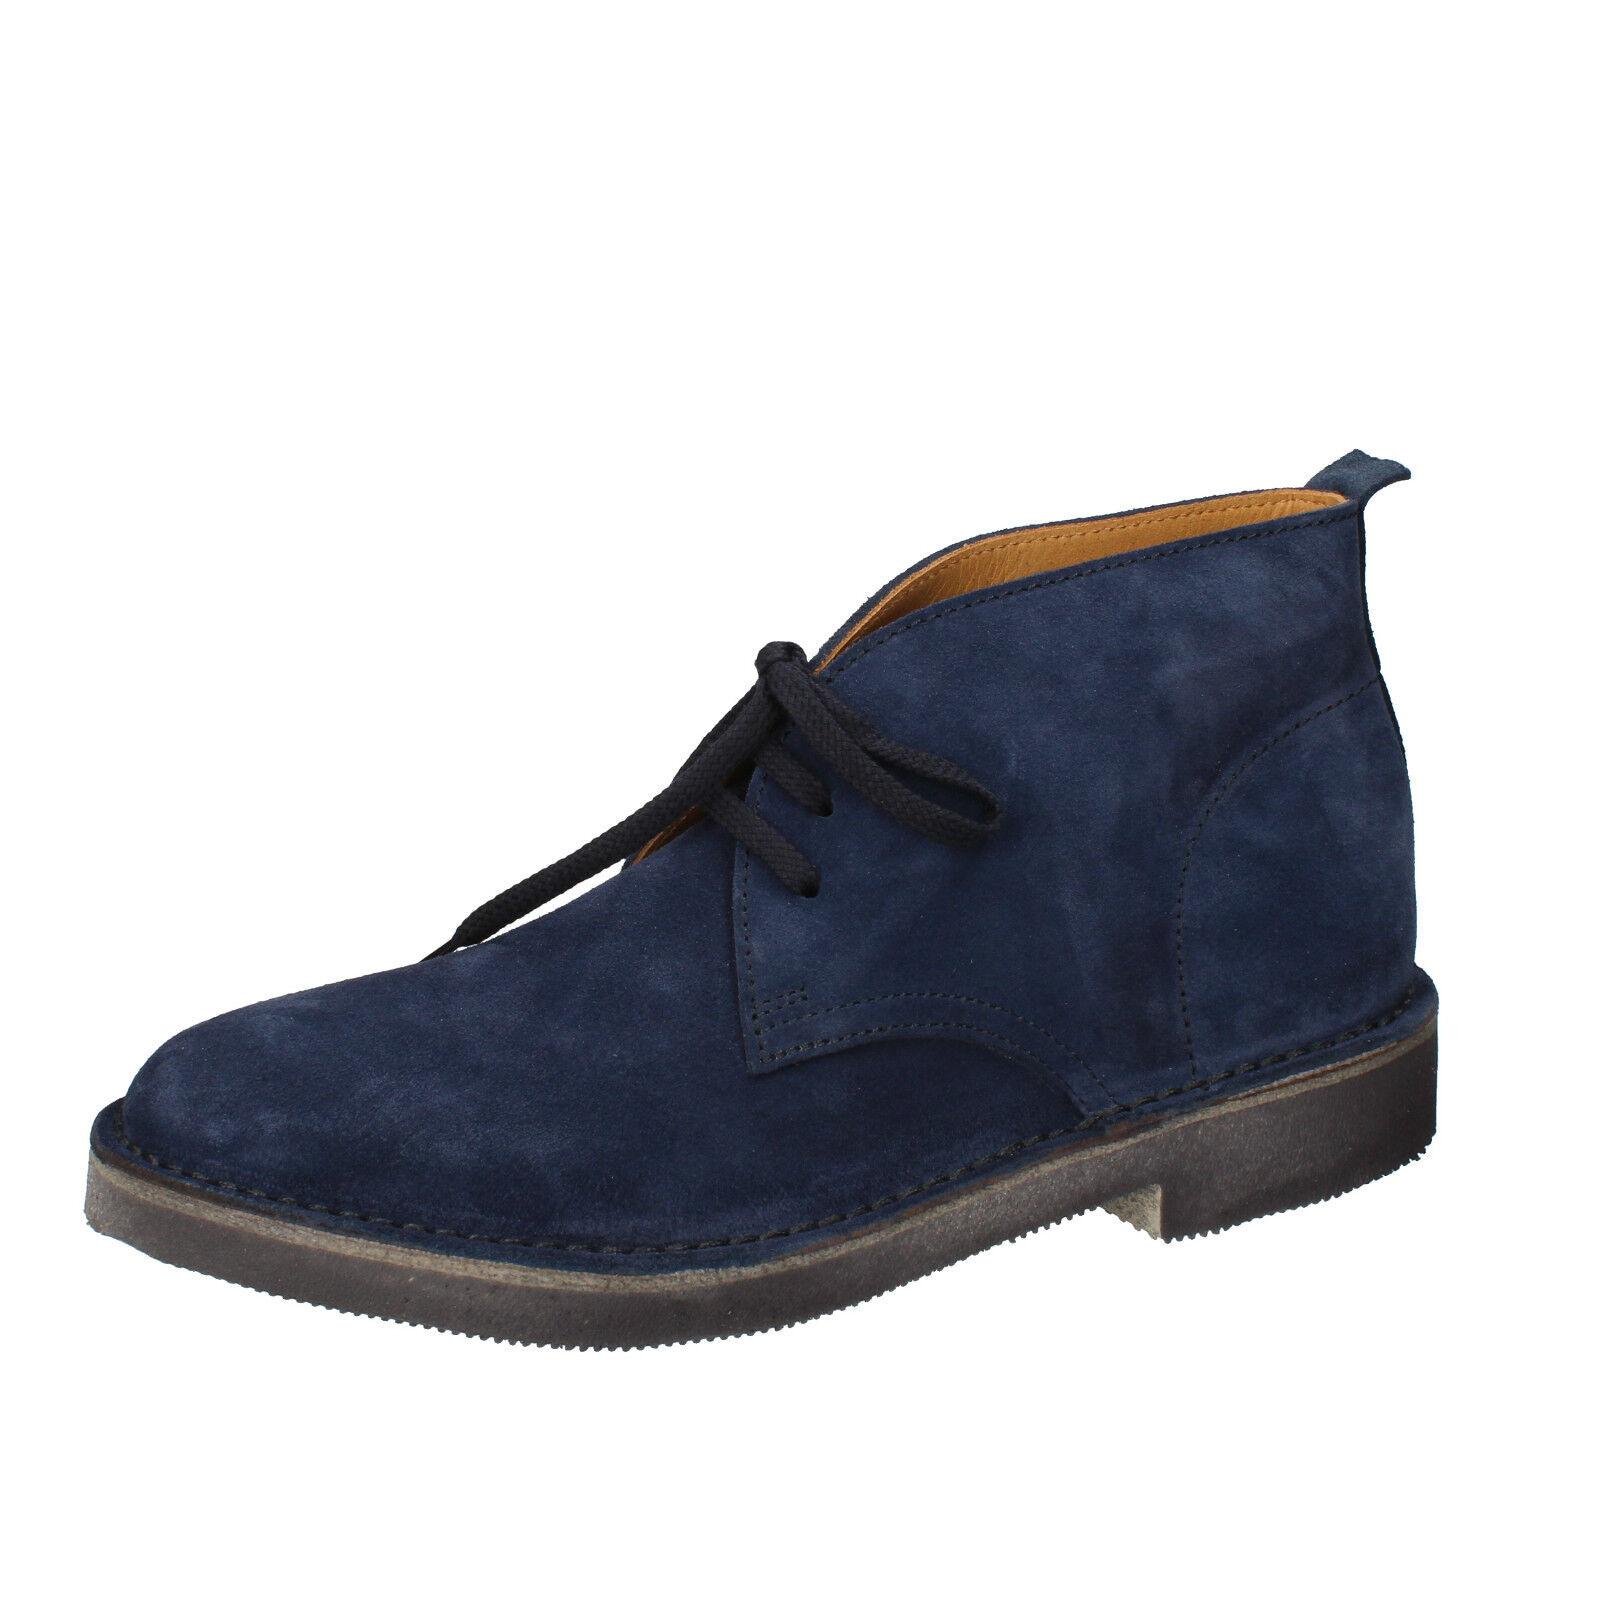 Herren schuhe MOMA 43 EU desert Stiefel blau blau blau wildleder AB327-D aed410